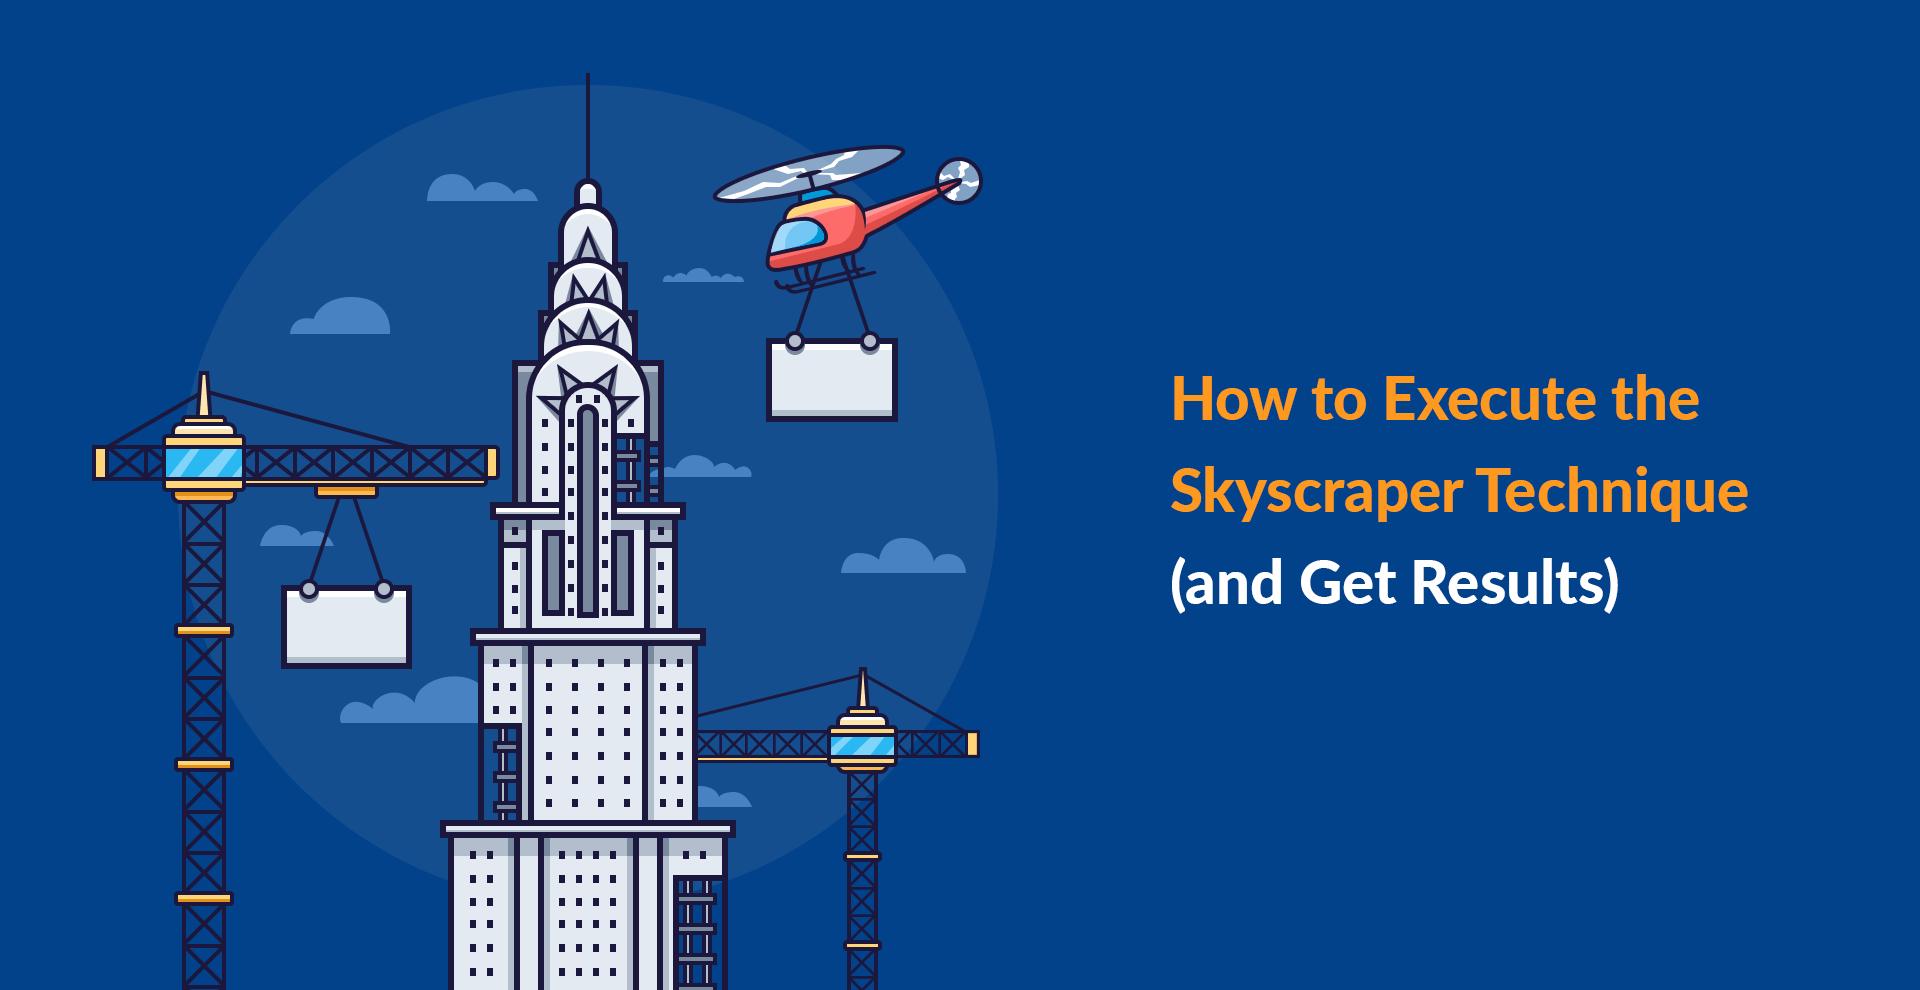 Phương pháp đi backlink Skyscraper technique